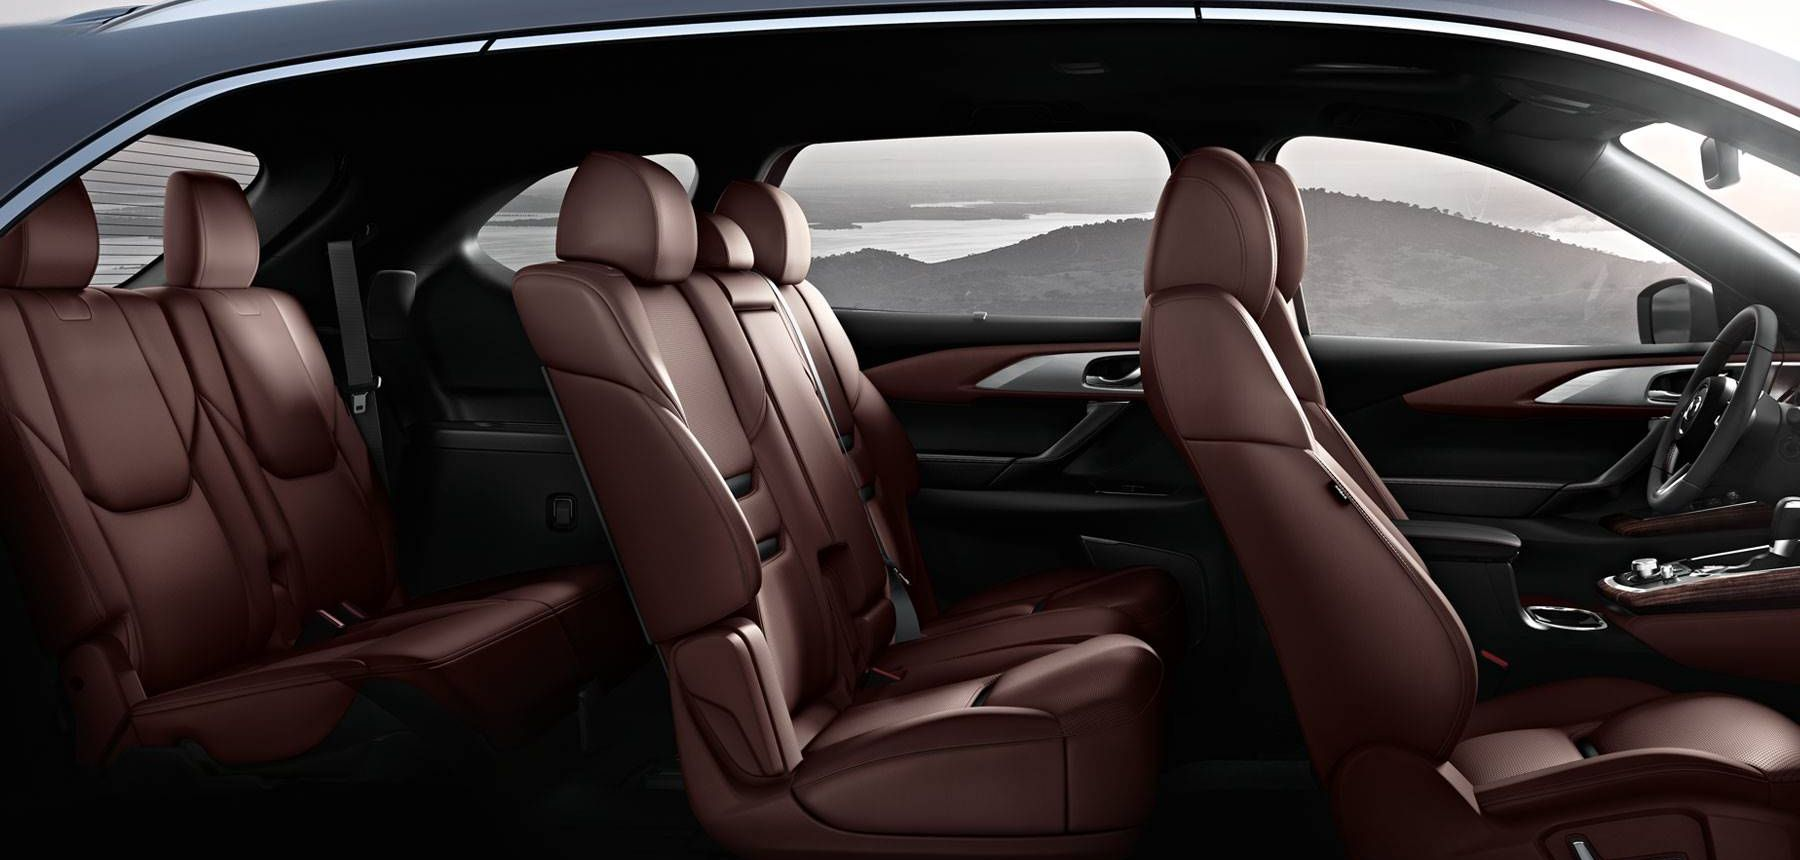 Spacious Interior Of The 2018 Mazda CX 9